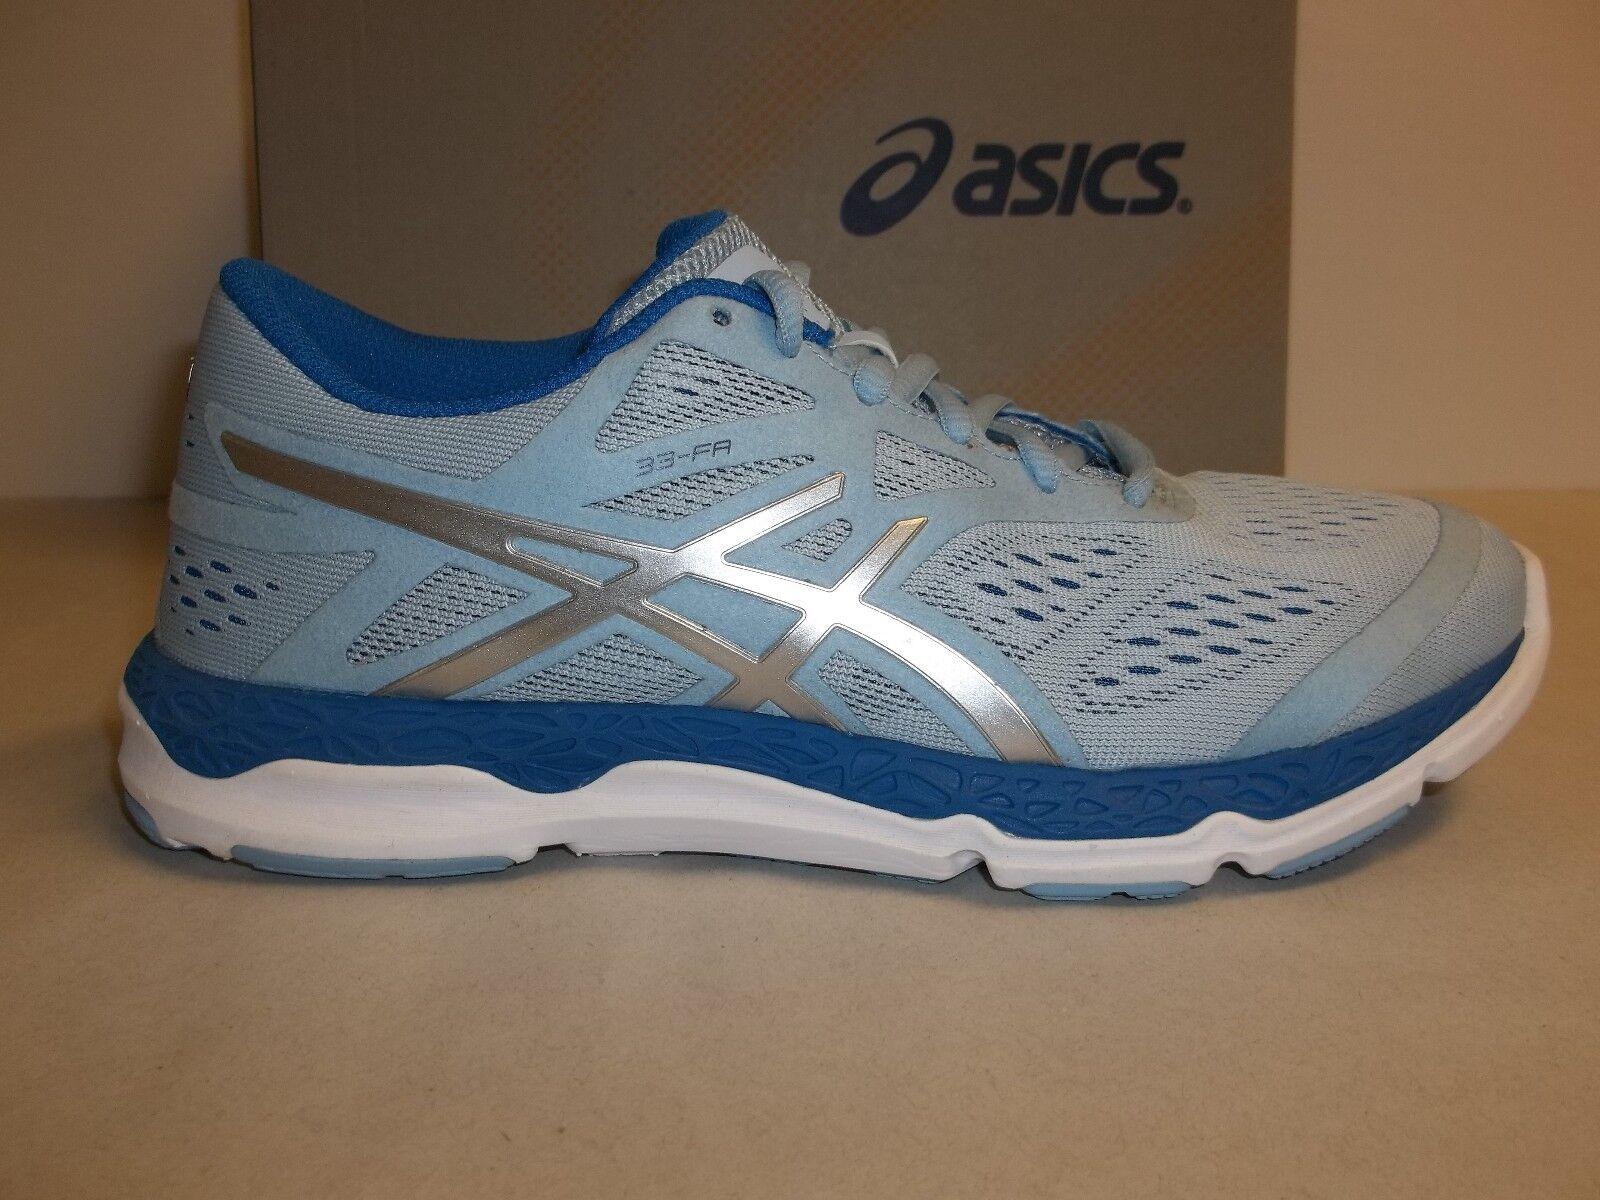 Asics Size 6 Style 33-FA Powder Blue Training Running Scarpe da Ginnastica New Donna Shoes